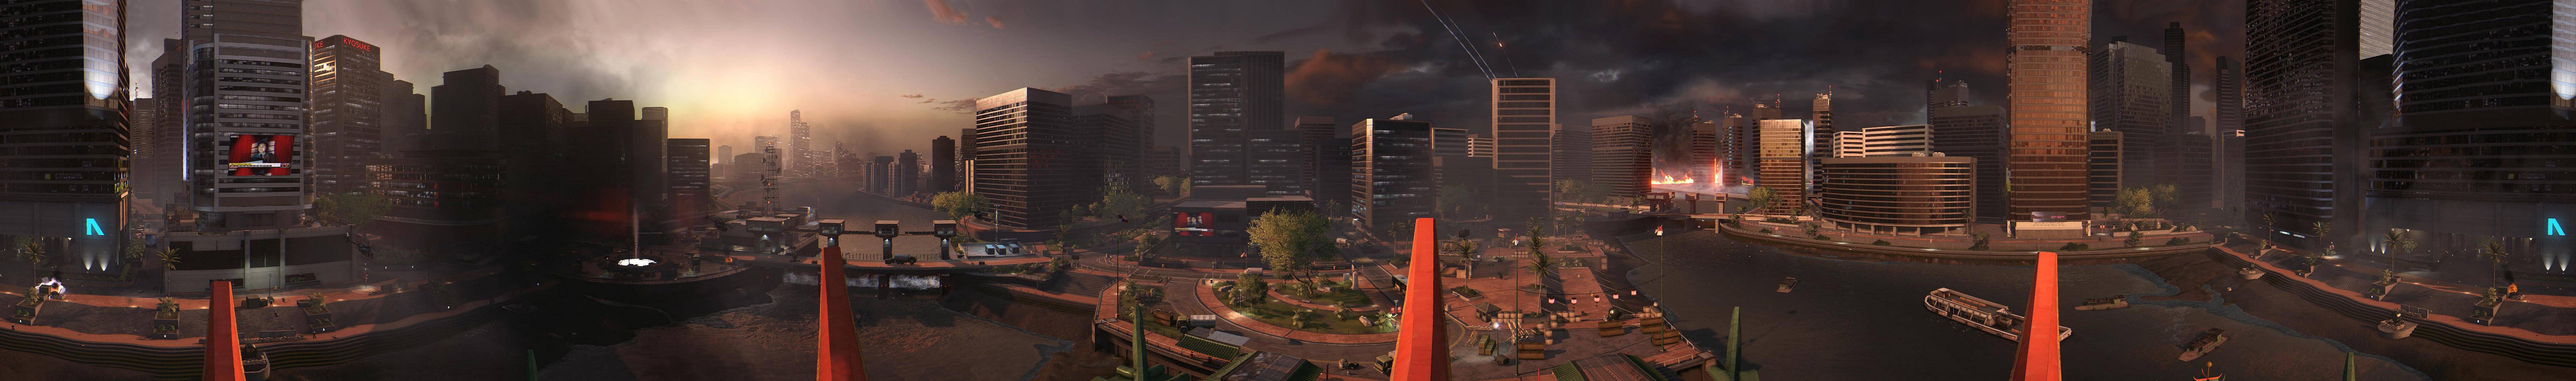 Battlefield 4 Dragon's Teeth в широком формате (панорама). - Изображение 4